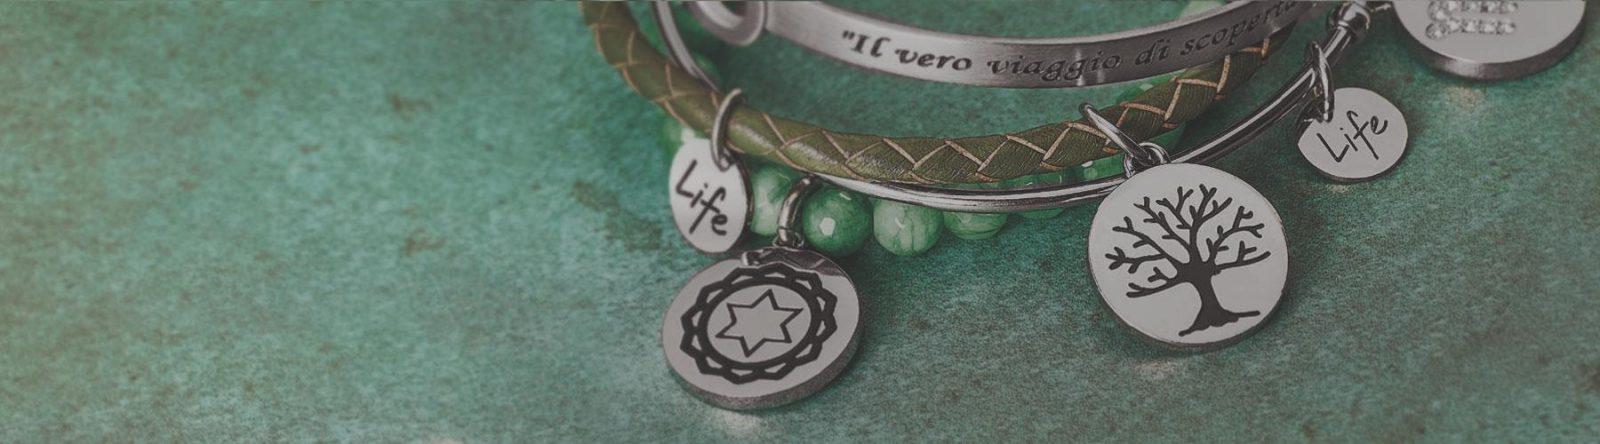 bracciali kidult symbols